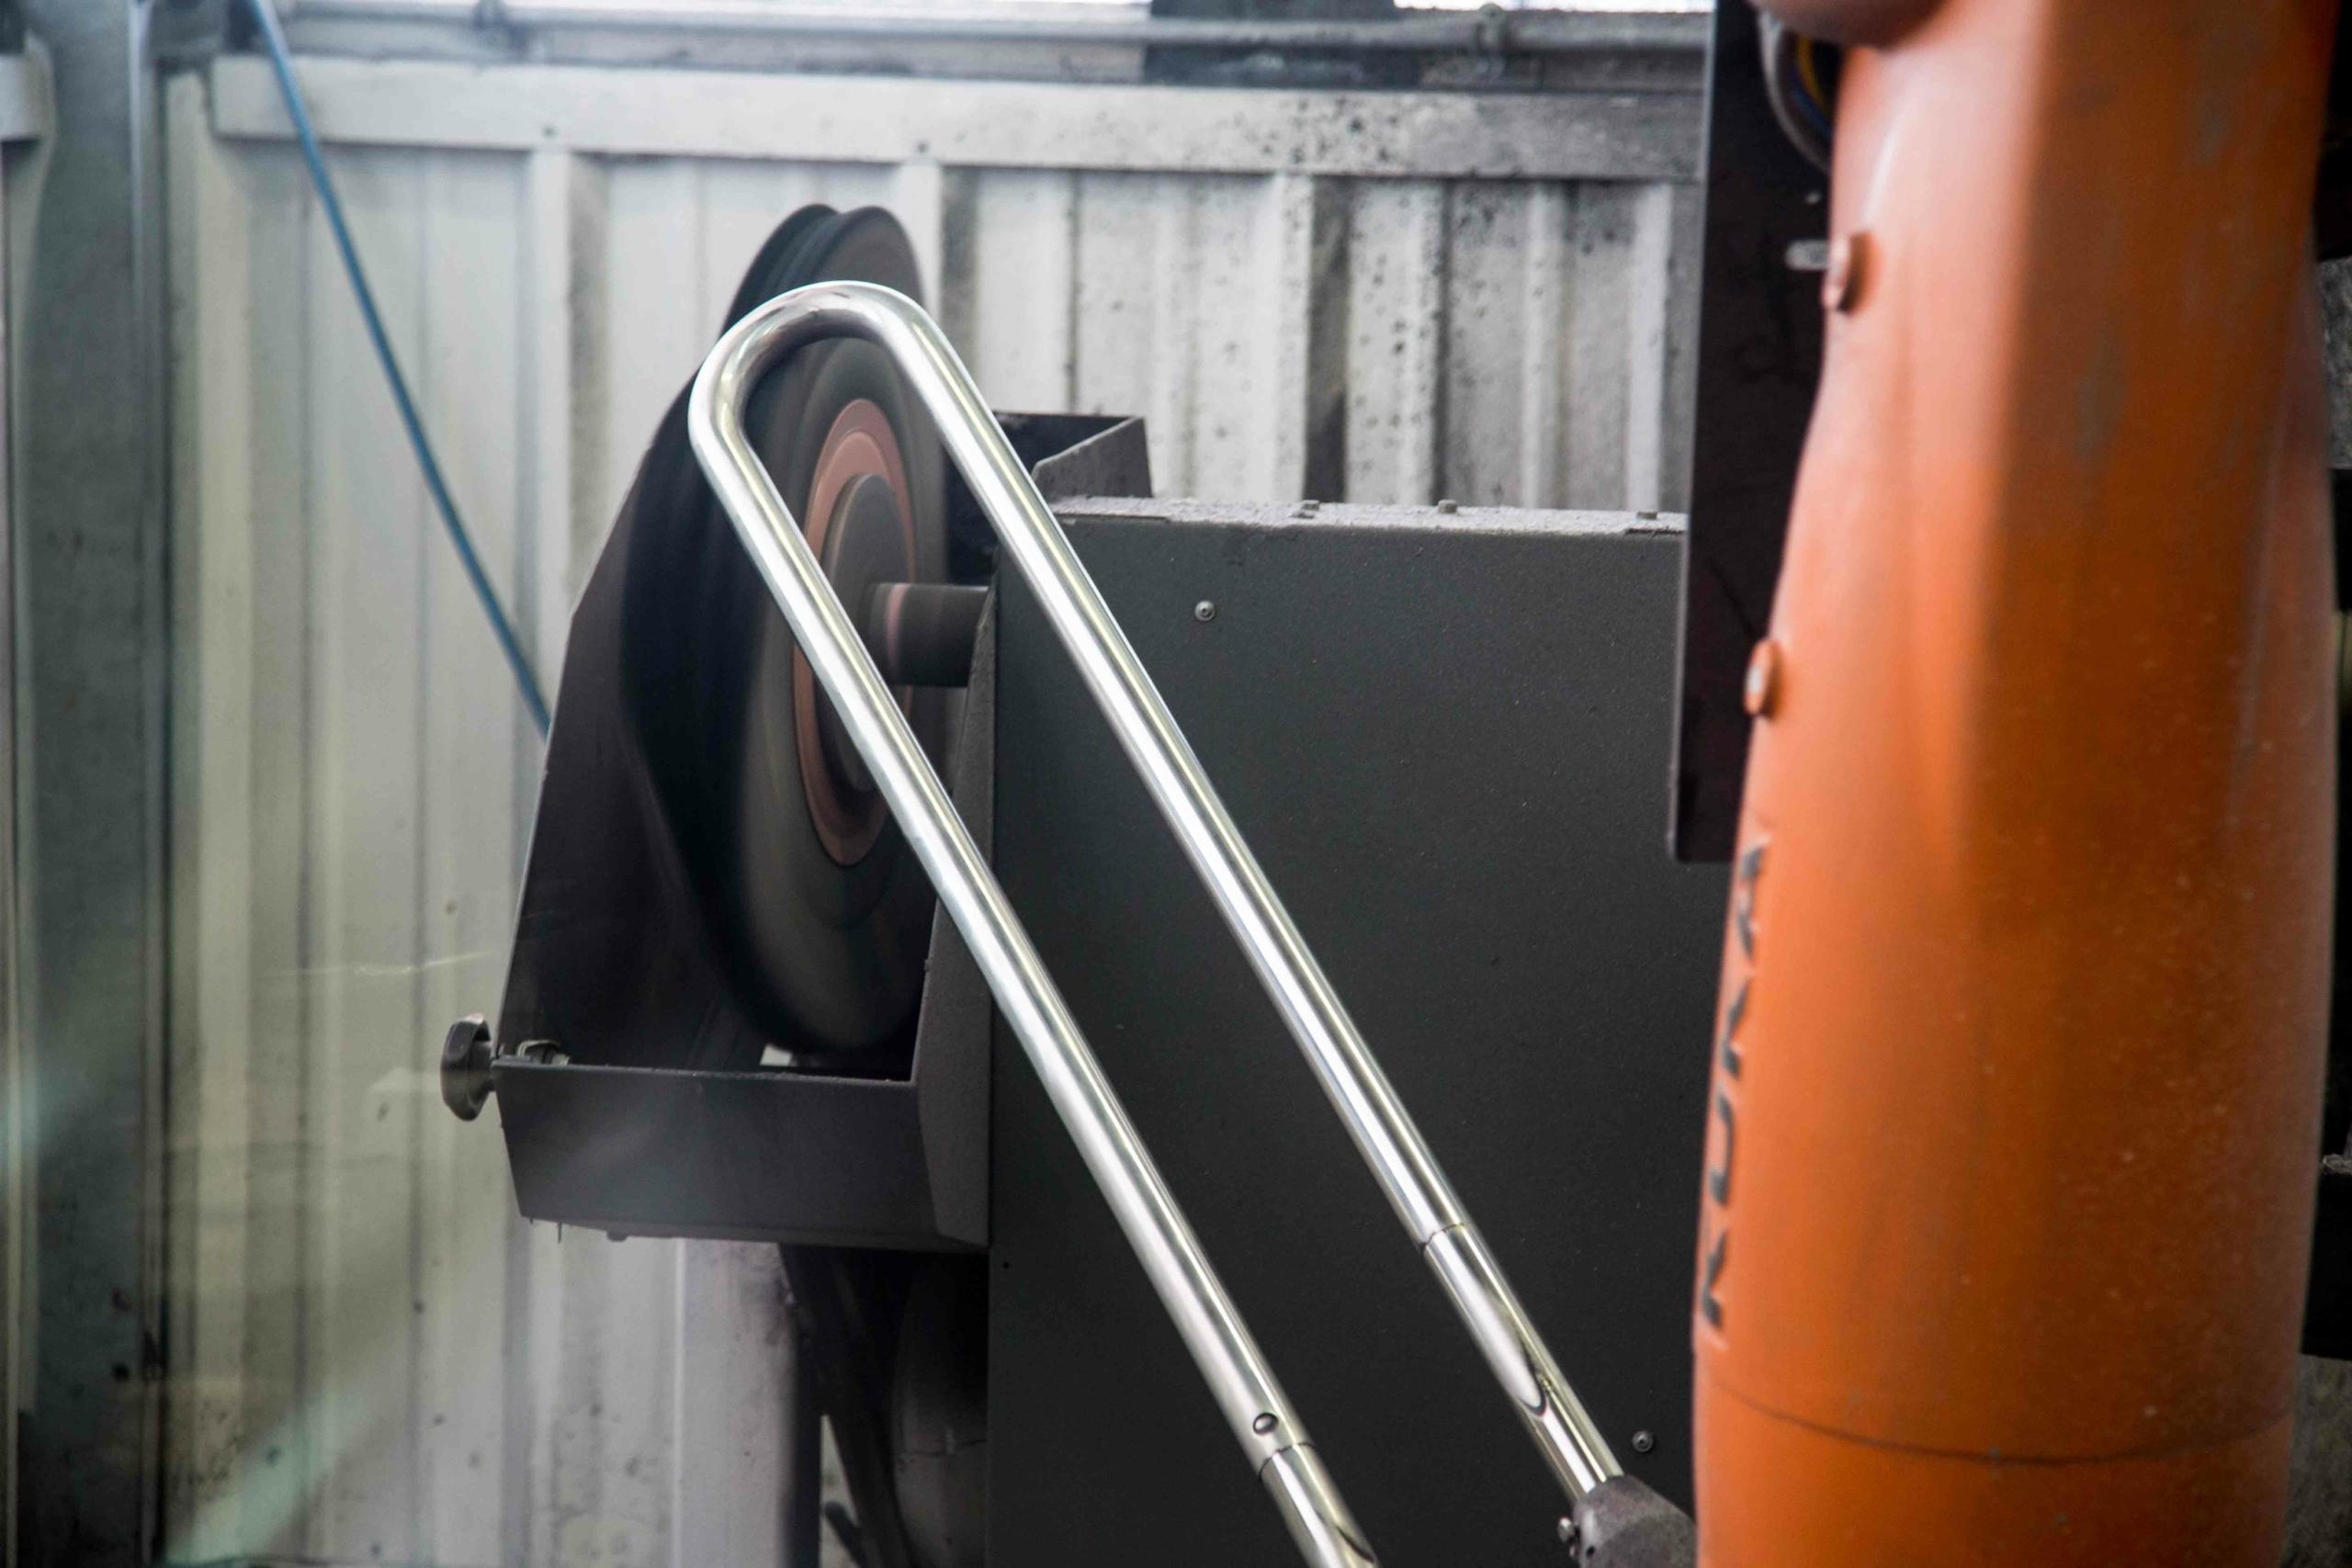 Lehnen Edelstahlbearbeitung- Polieren mit dem KUKA-Roboter